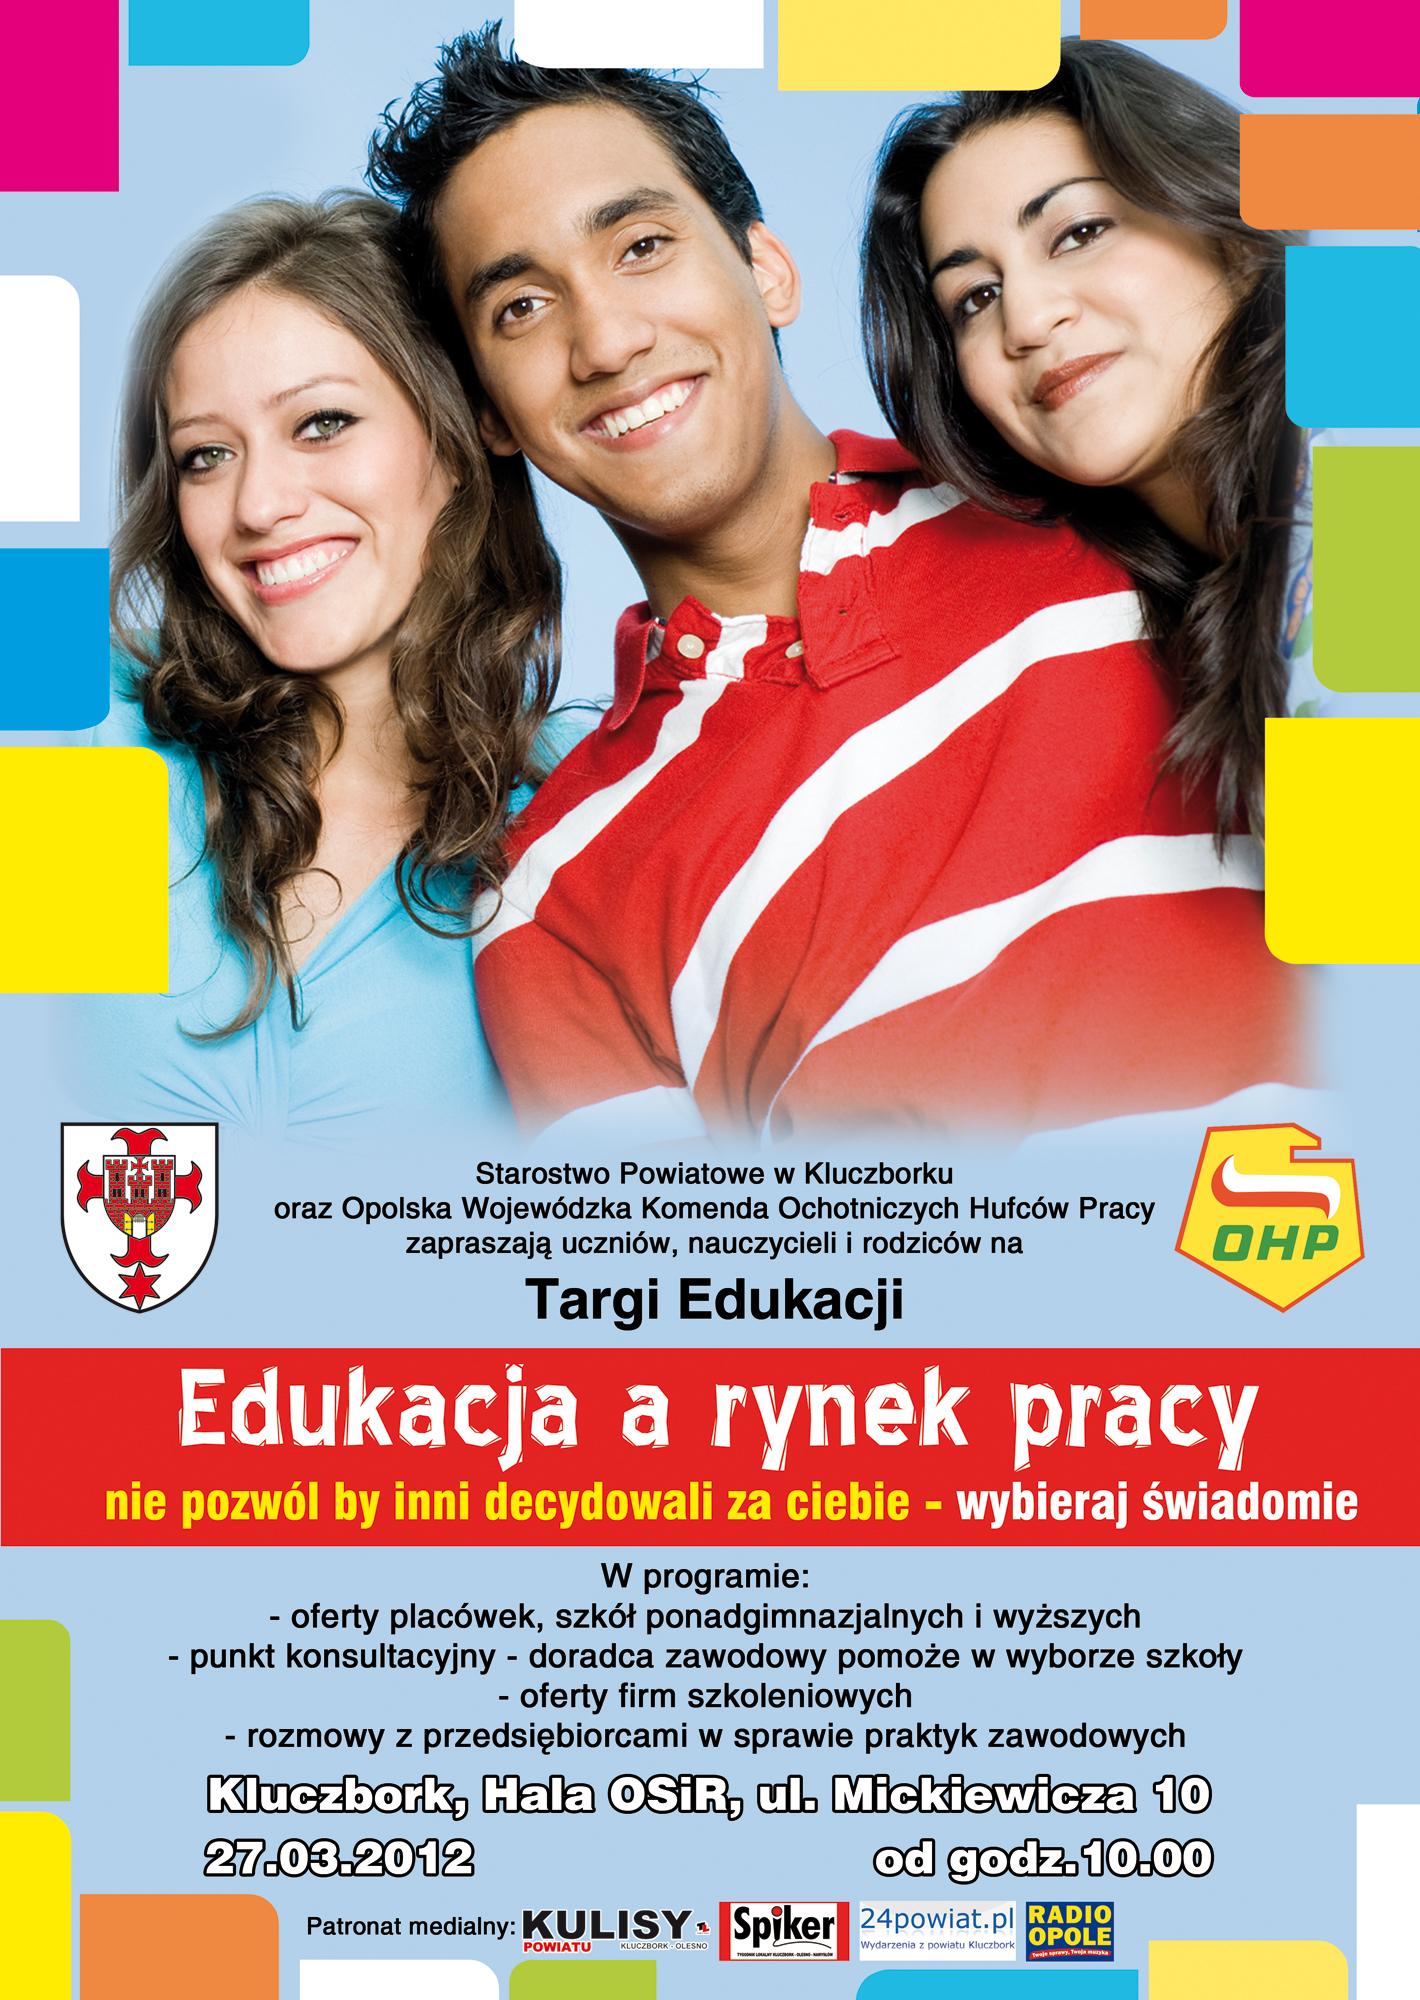 plakat _Targi Edukacji.jpeg